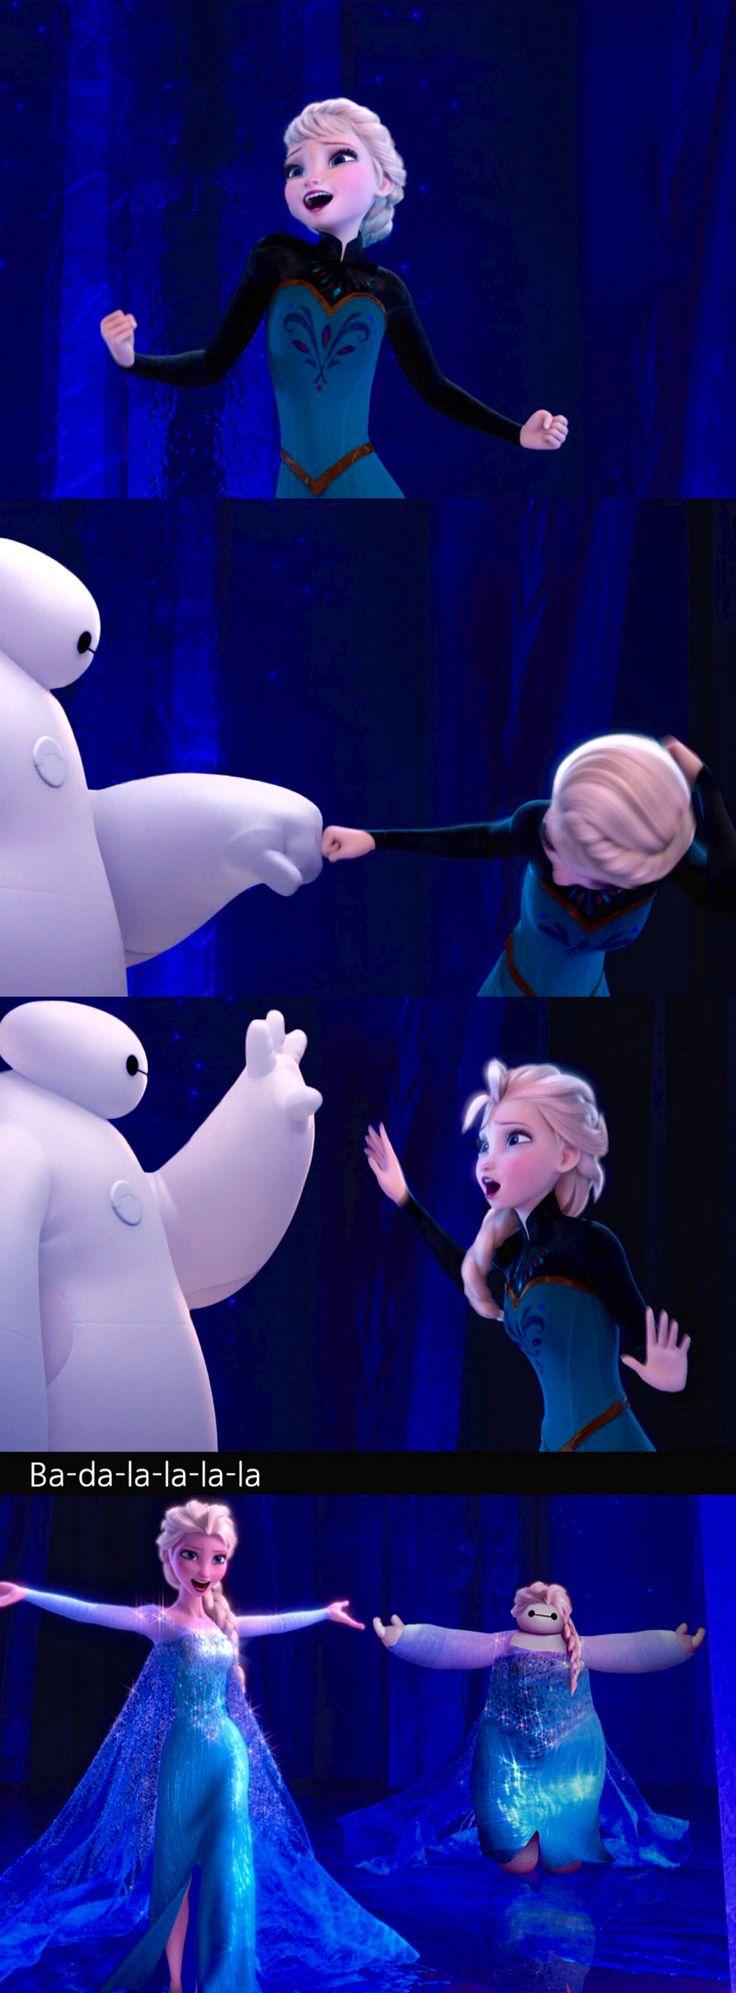 Kkkkkkkkk até a Elsa                                                                                                                                                                                 Mais